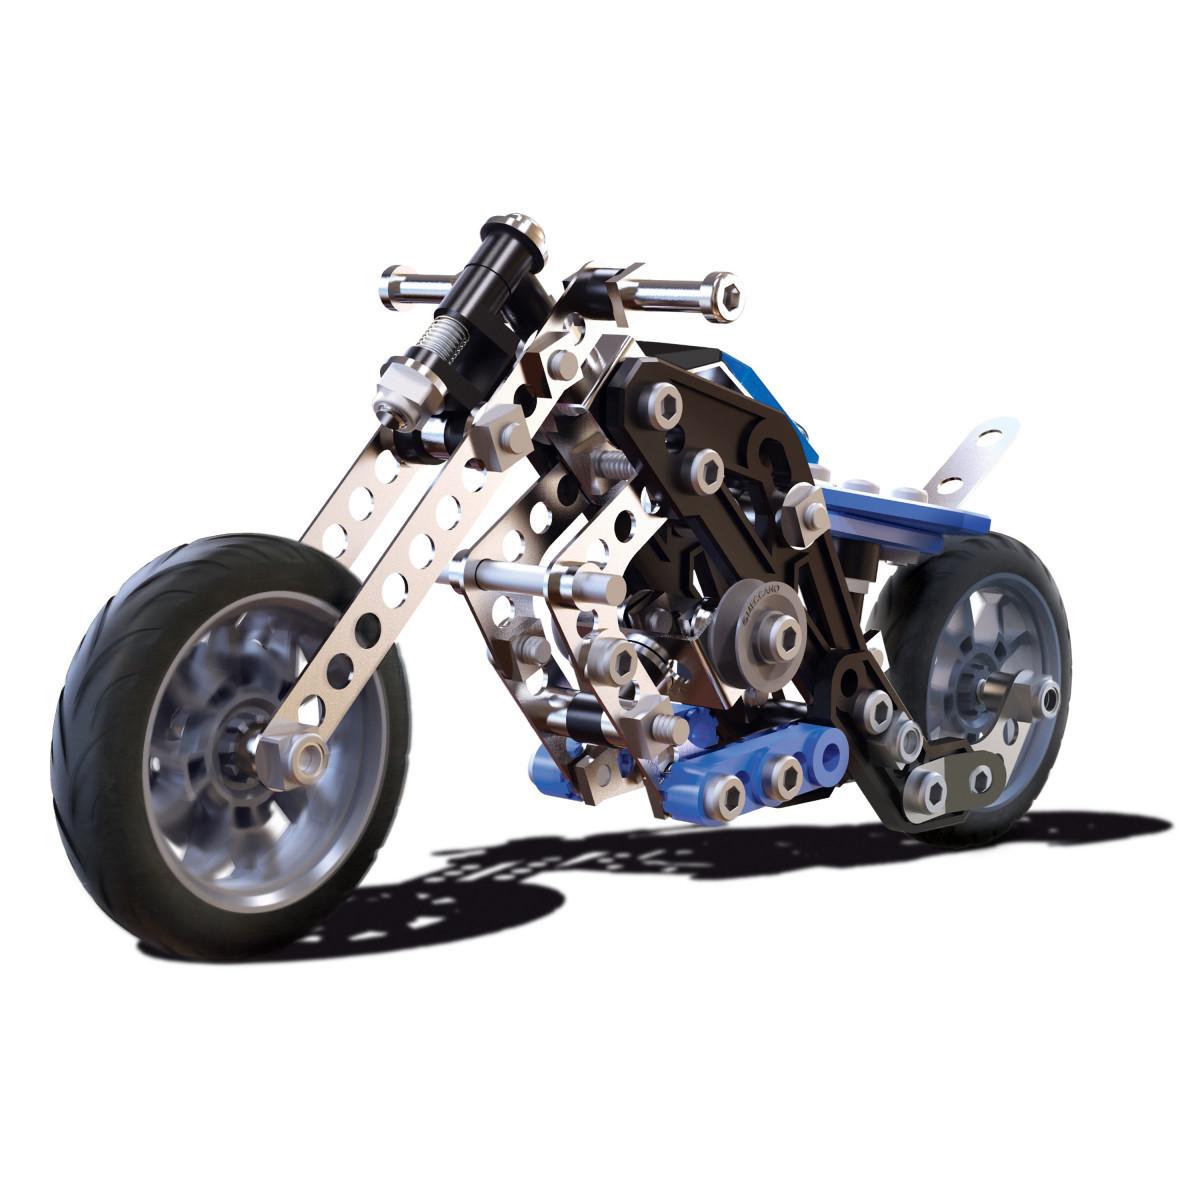 6036044 MOTO 5 MODELES MECCANO